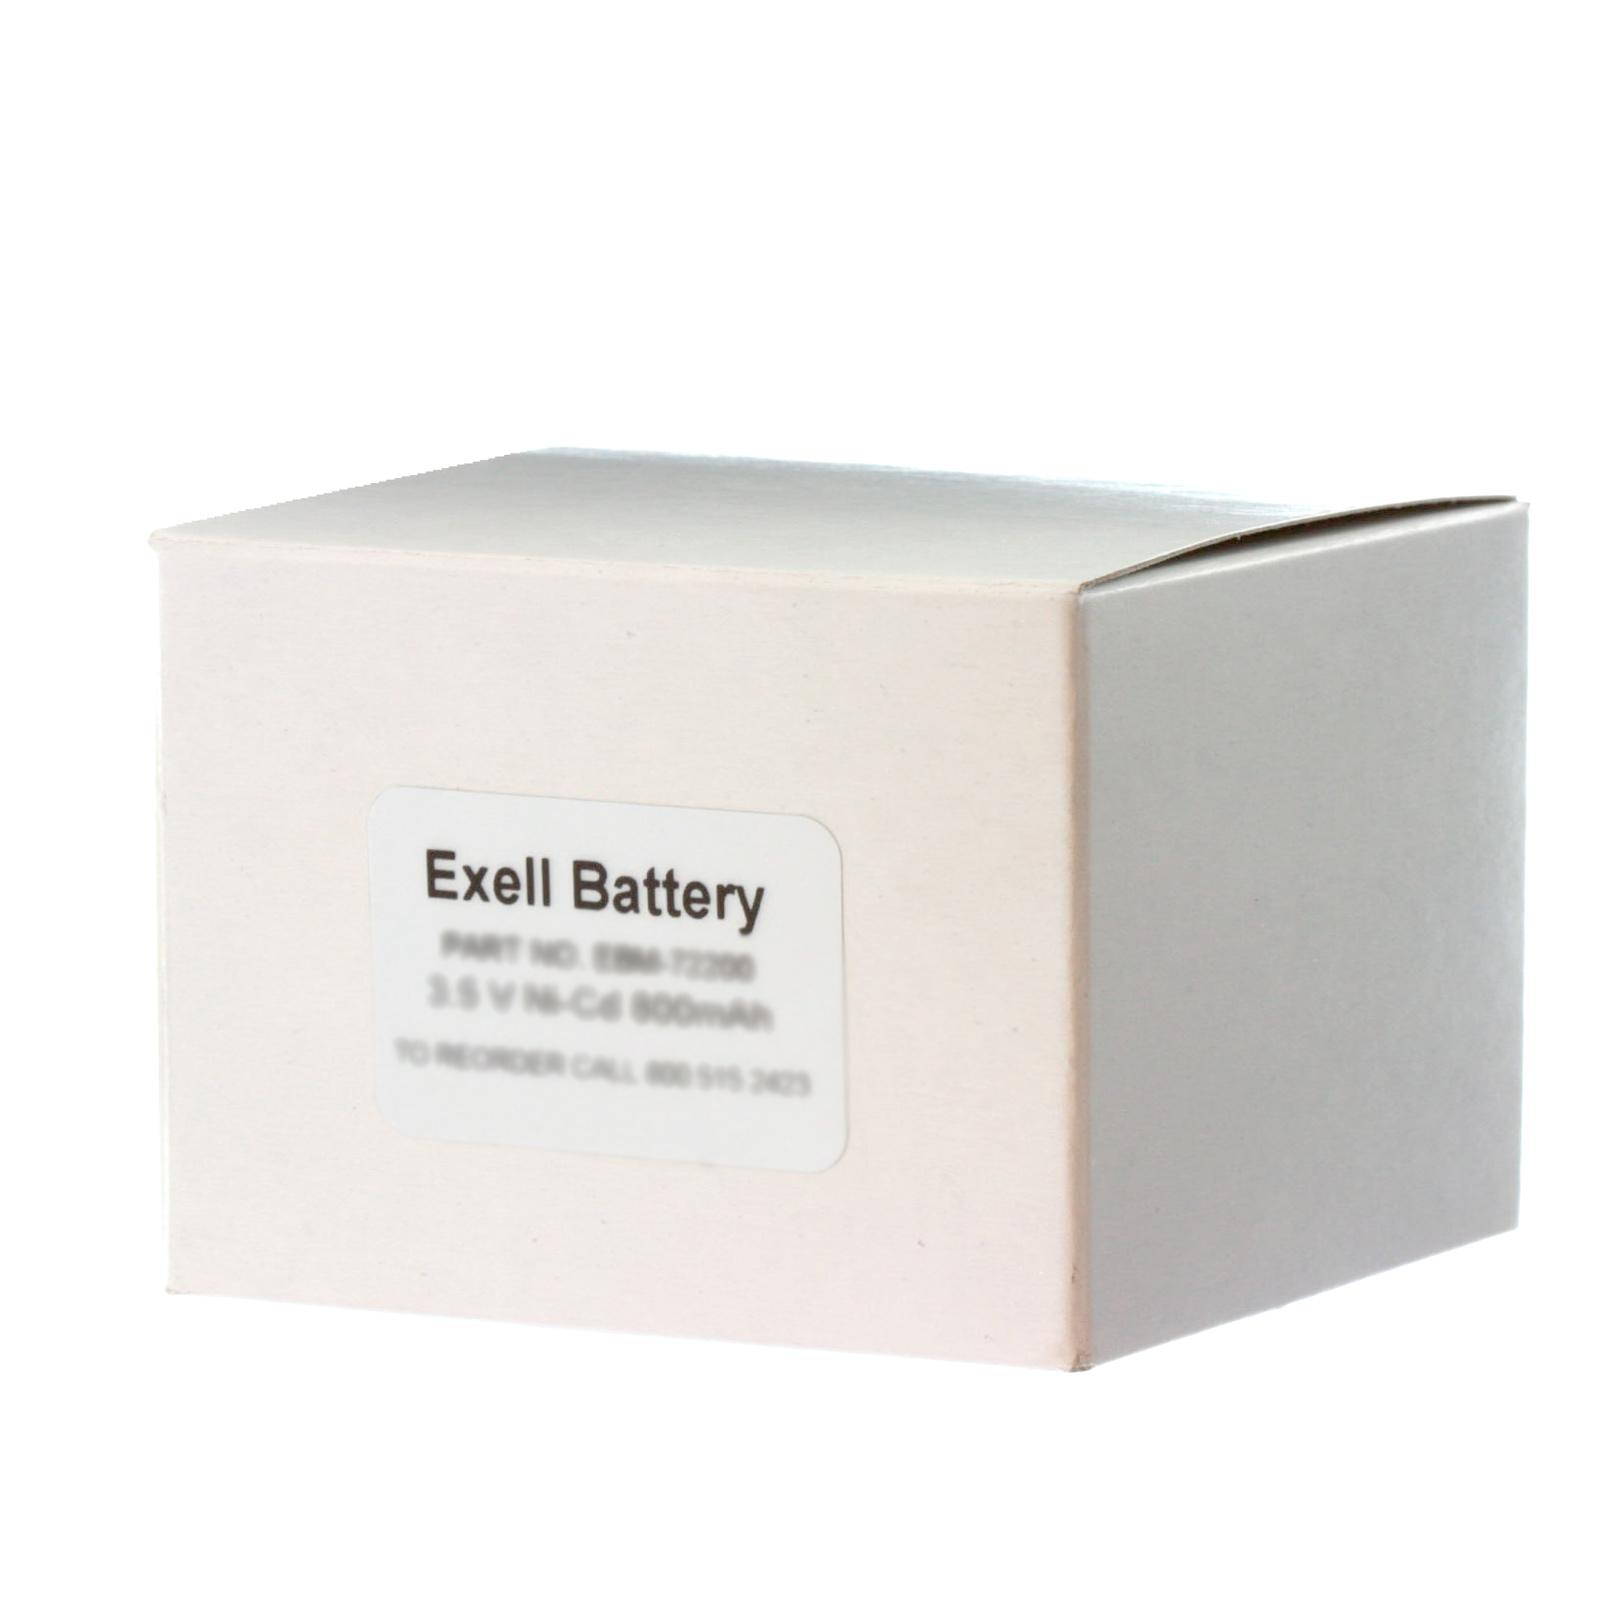 Razor Battery For Norelco 20 Xl 4822 13810611 5625x 5812xl